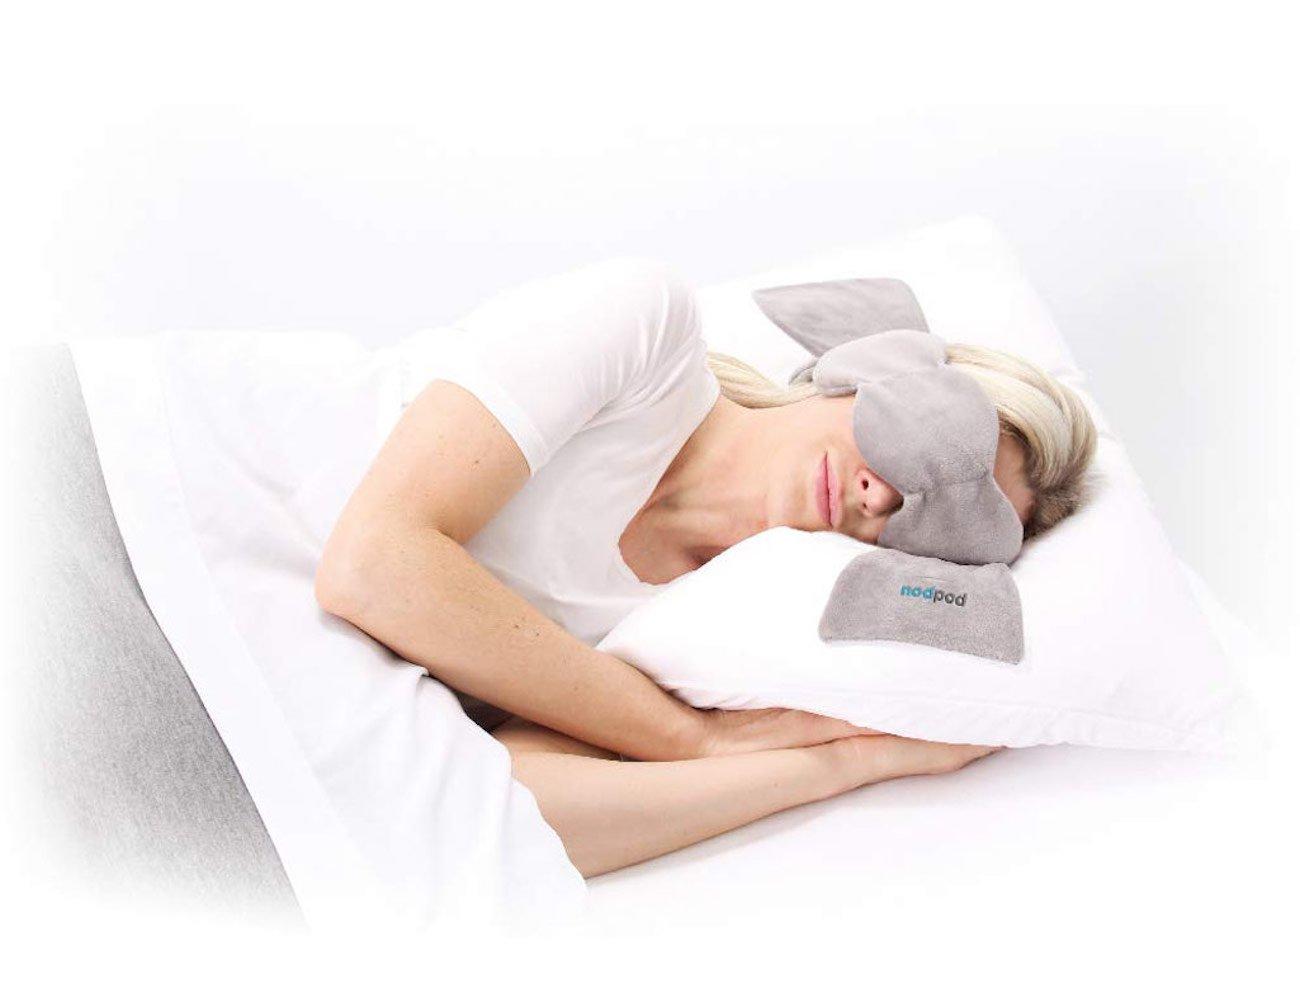 10 Sleep tech gadgets to help you get some shuteye - nodpod 02